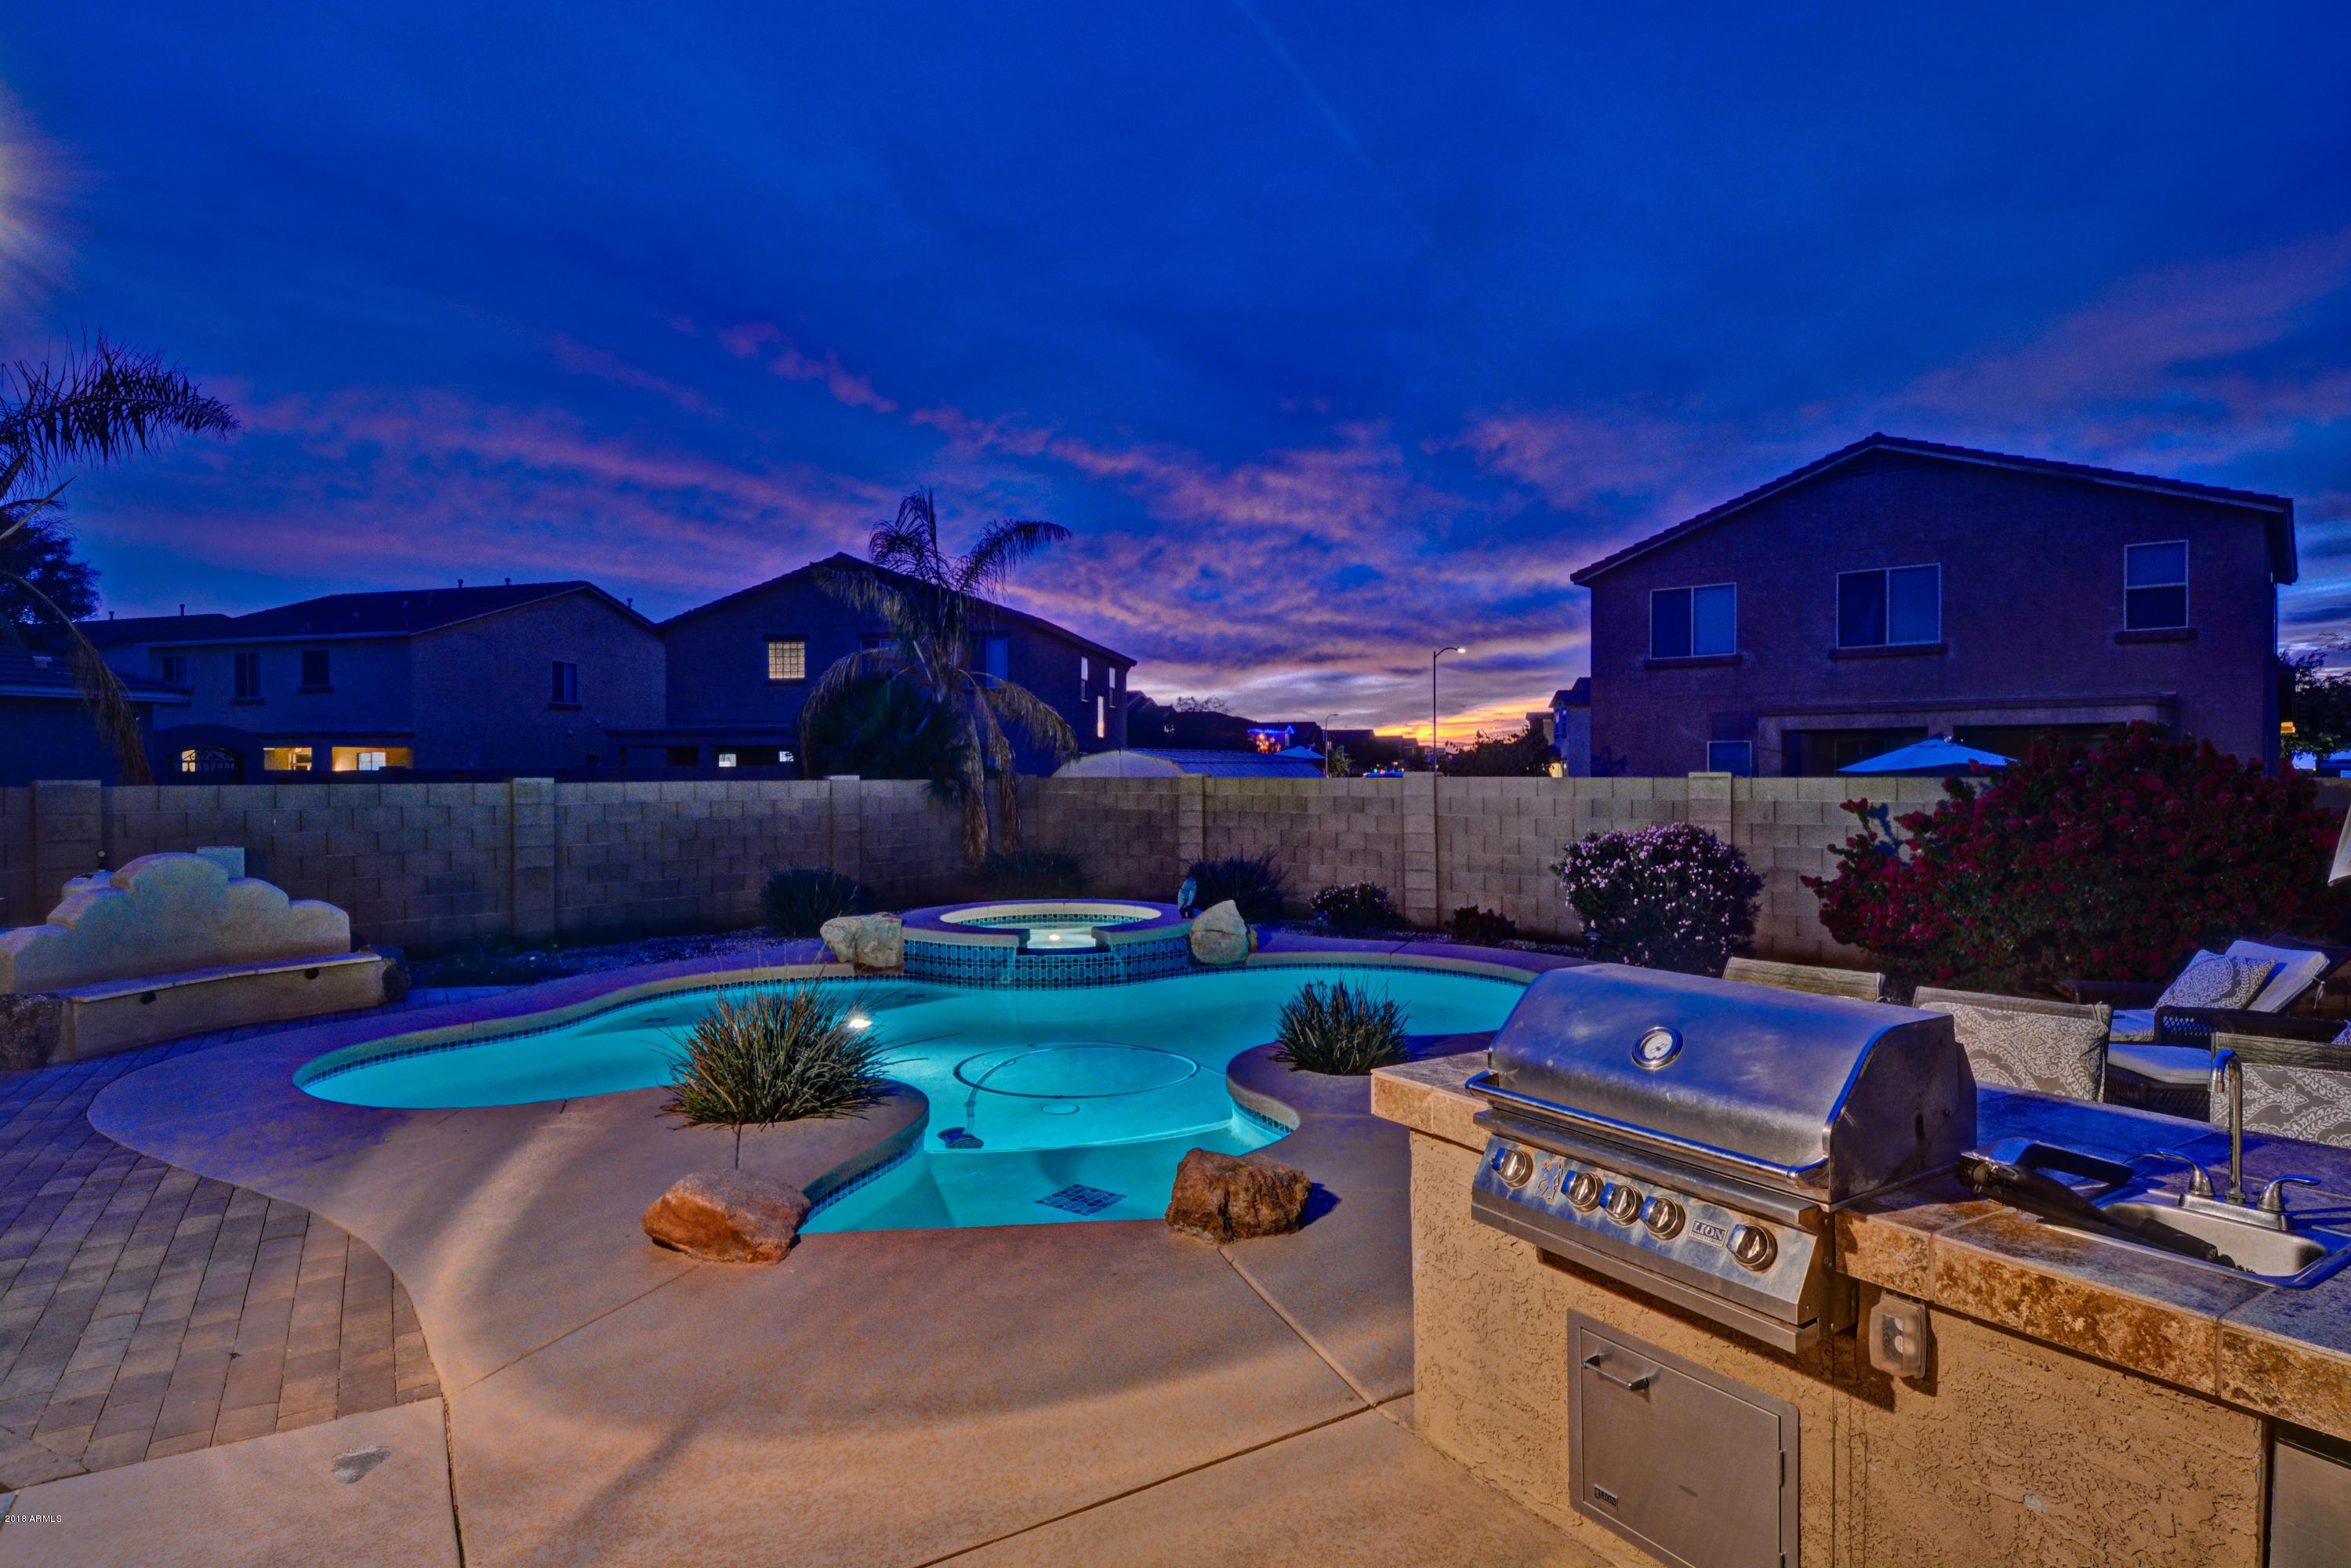 MLS 5854359 6844 W CARTER Road, Laveen, AZ 85339 Laveen AZ Private Pool